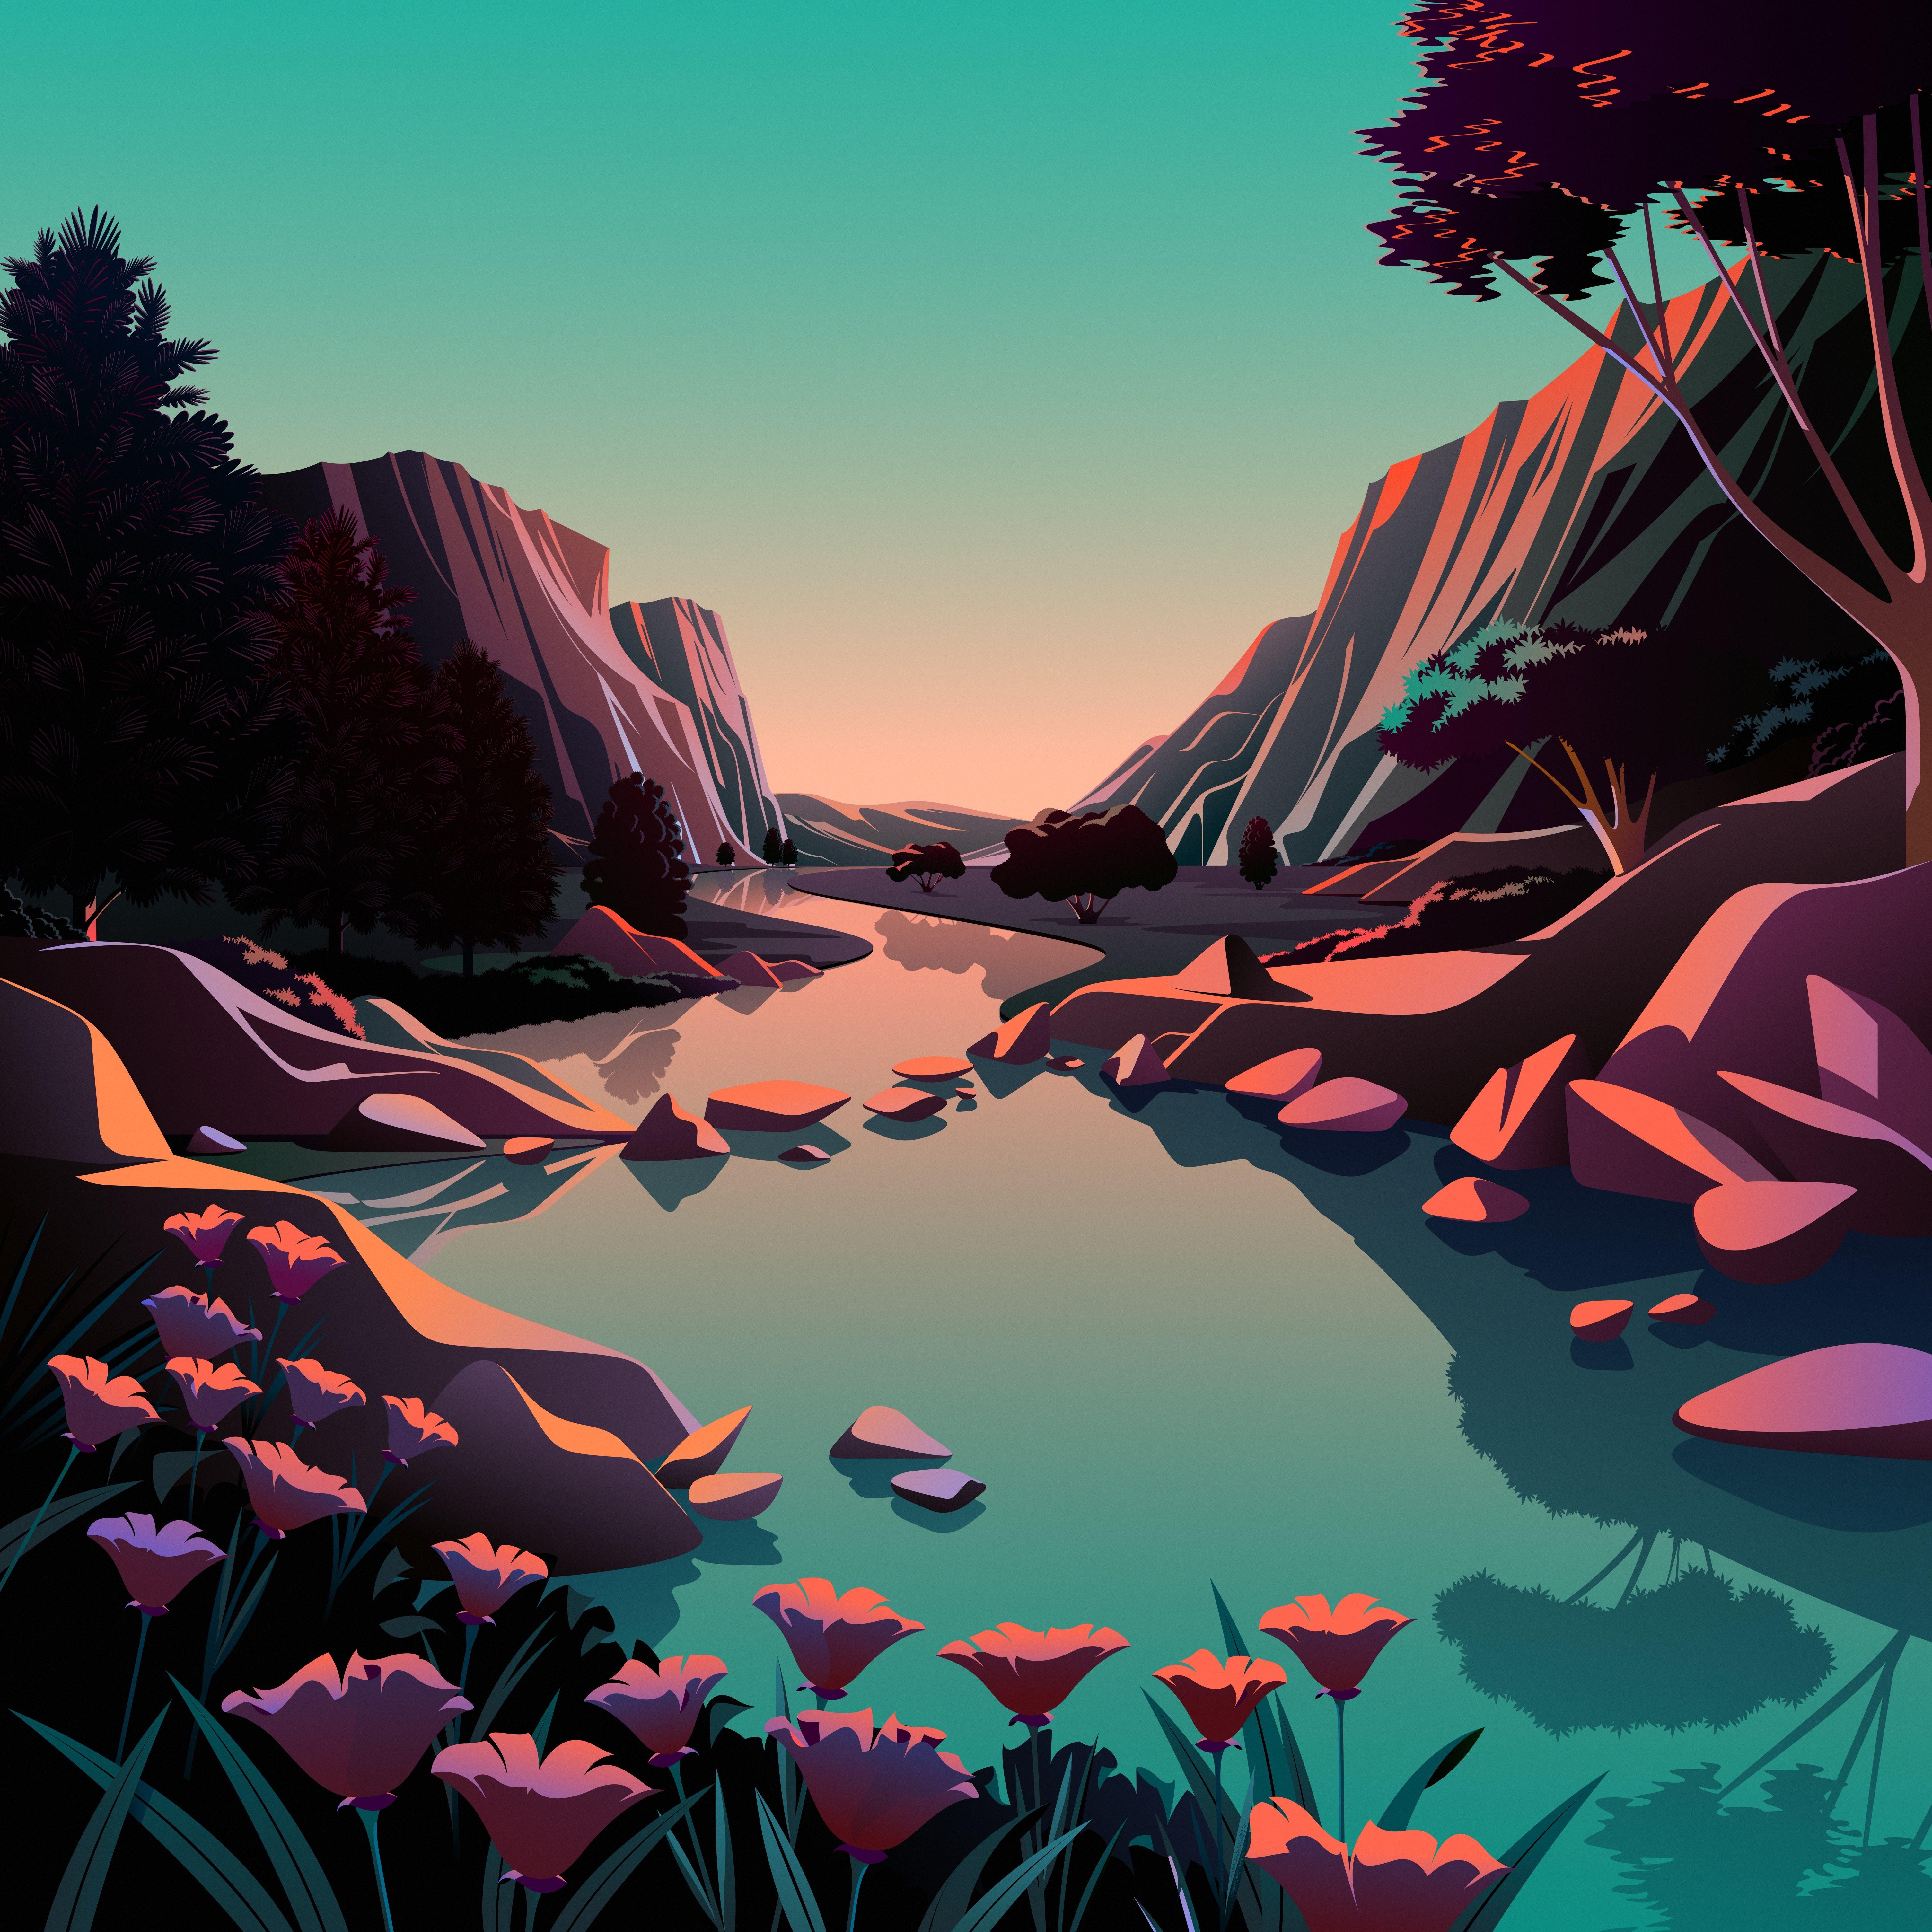 macOS Big Sur The Lake 1 dragged